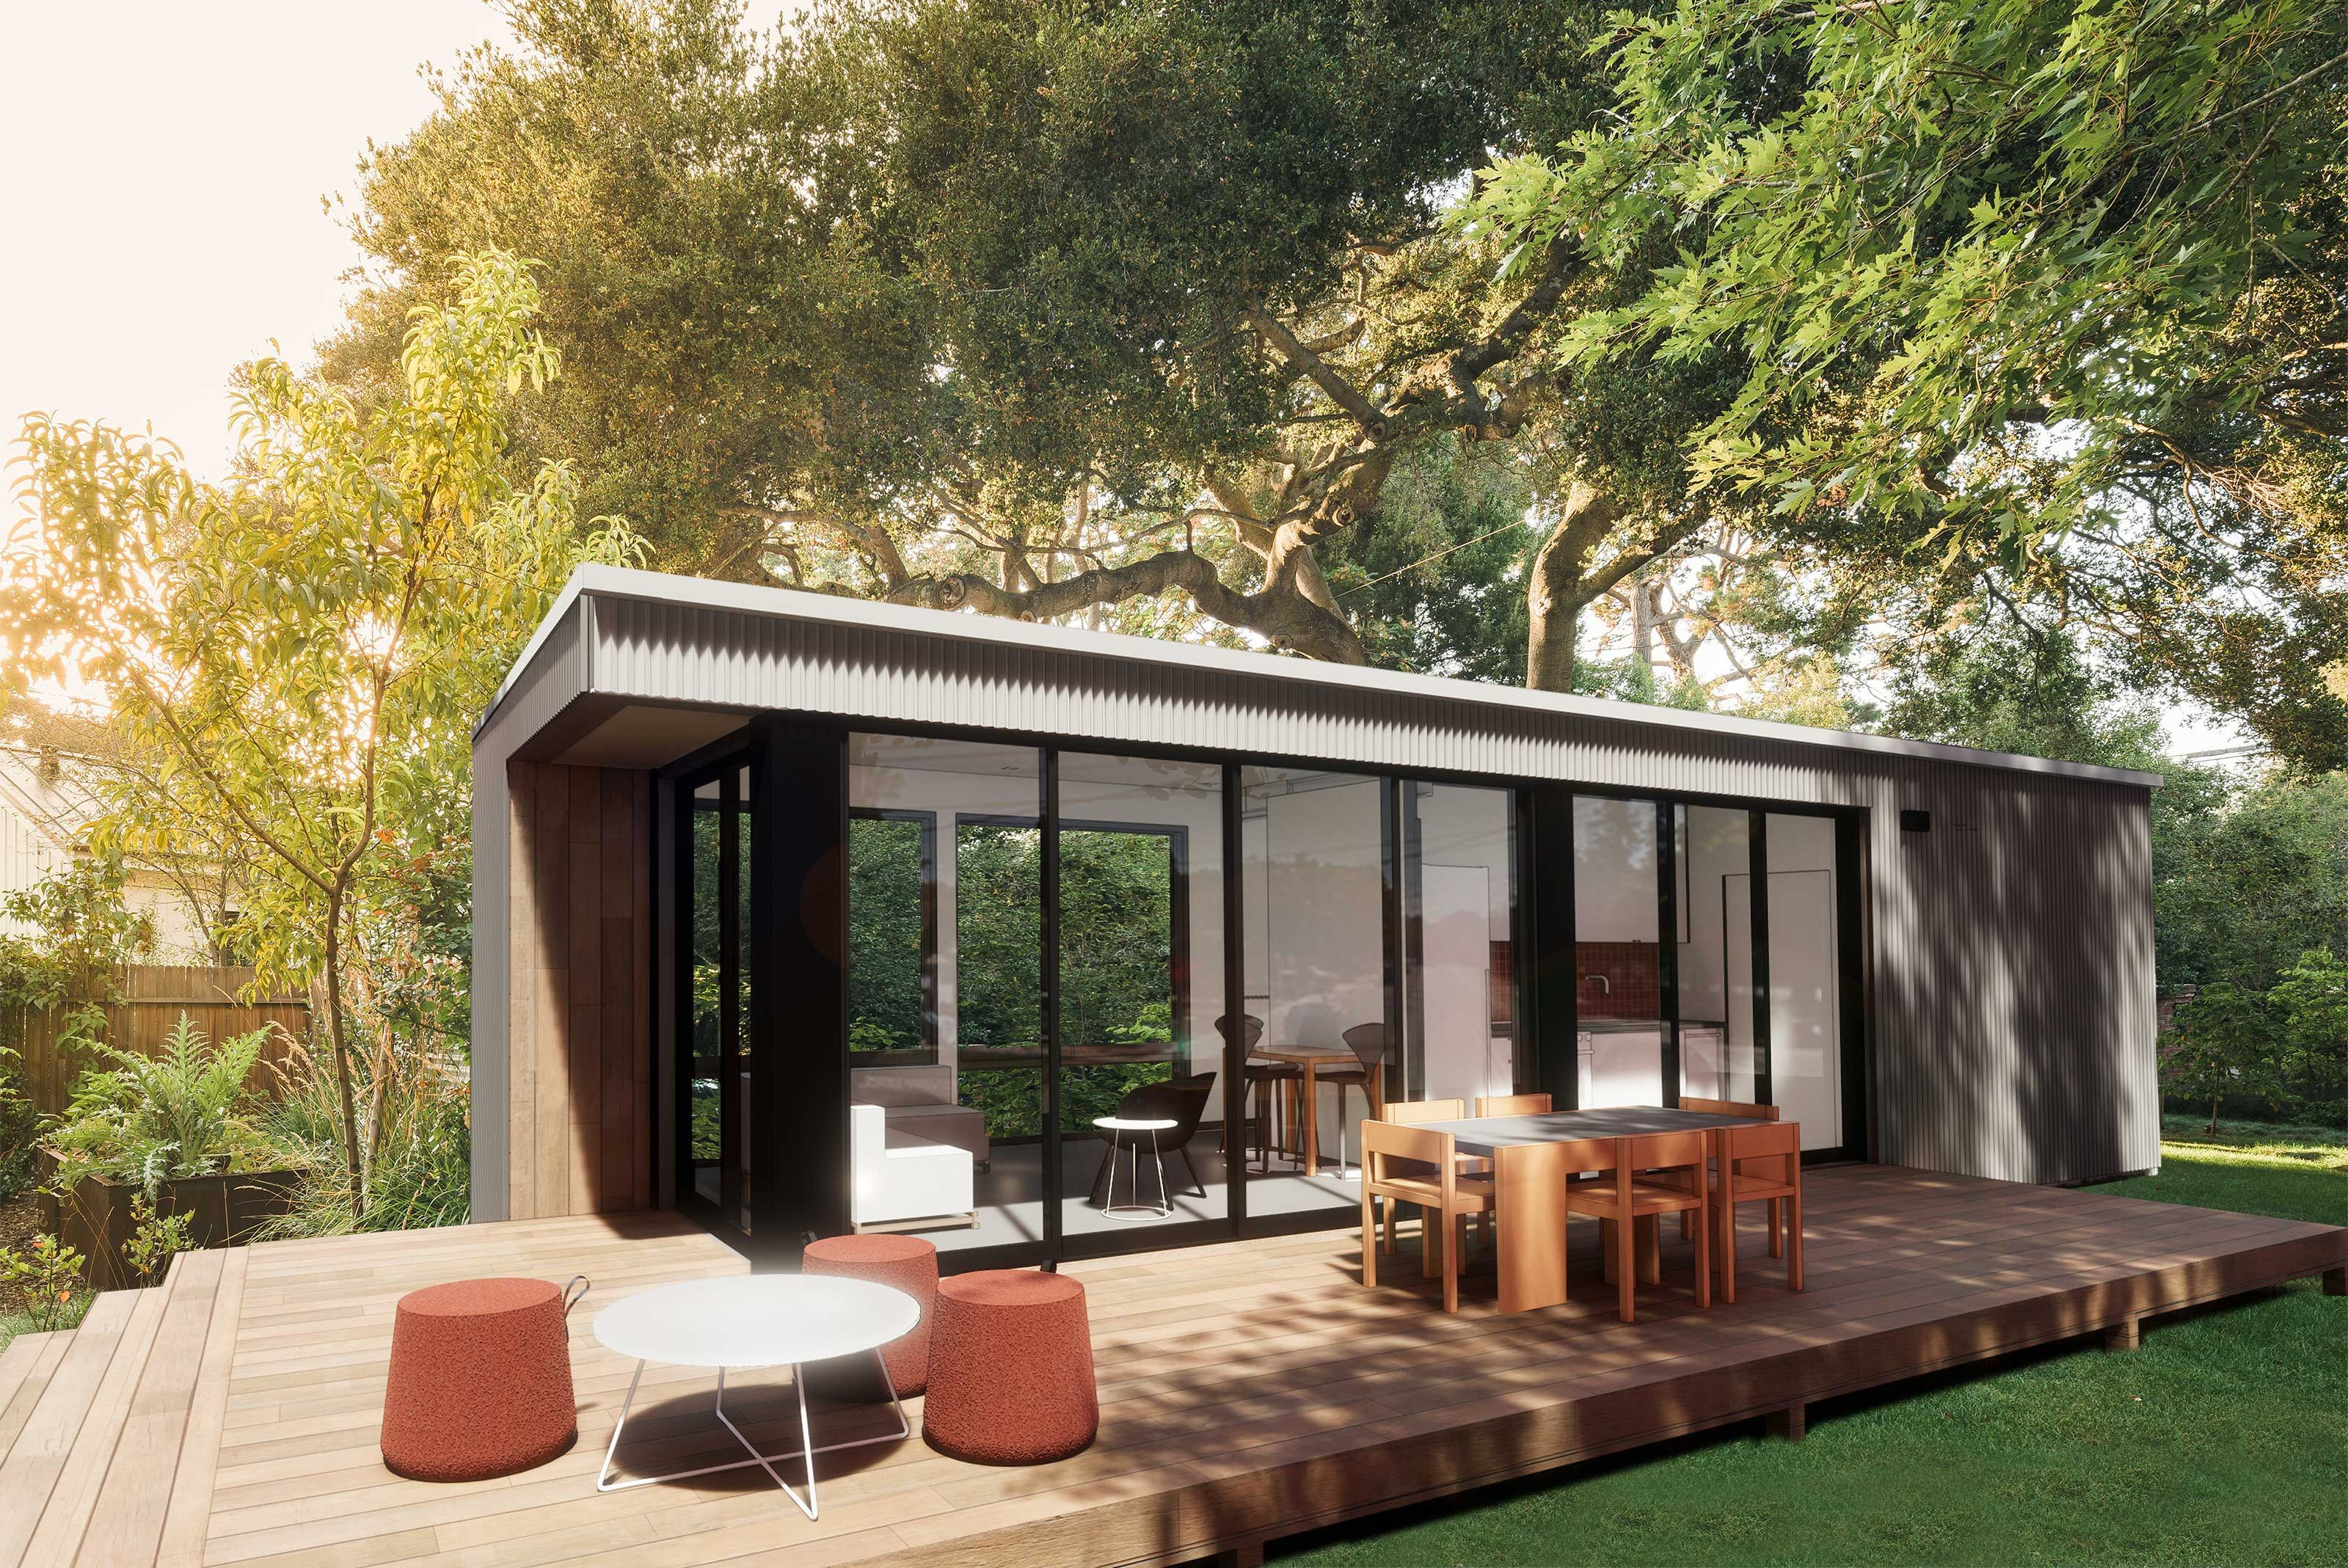 Connect 2 The Perfect Adu Grannyflat Or Guesthouse Housing Solution 460sq Ft 1br 1ba Prefab Homes Modern Prefab Homes Prefab